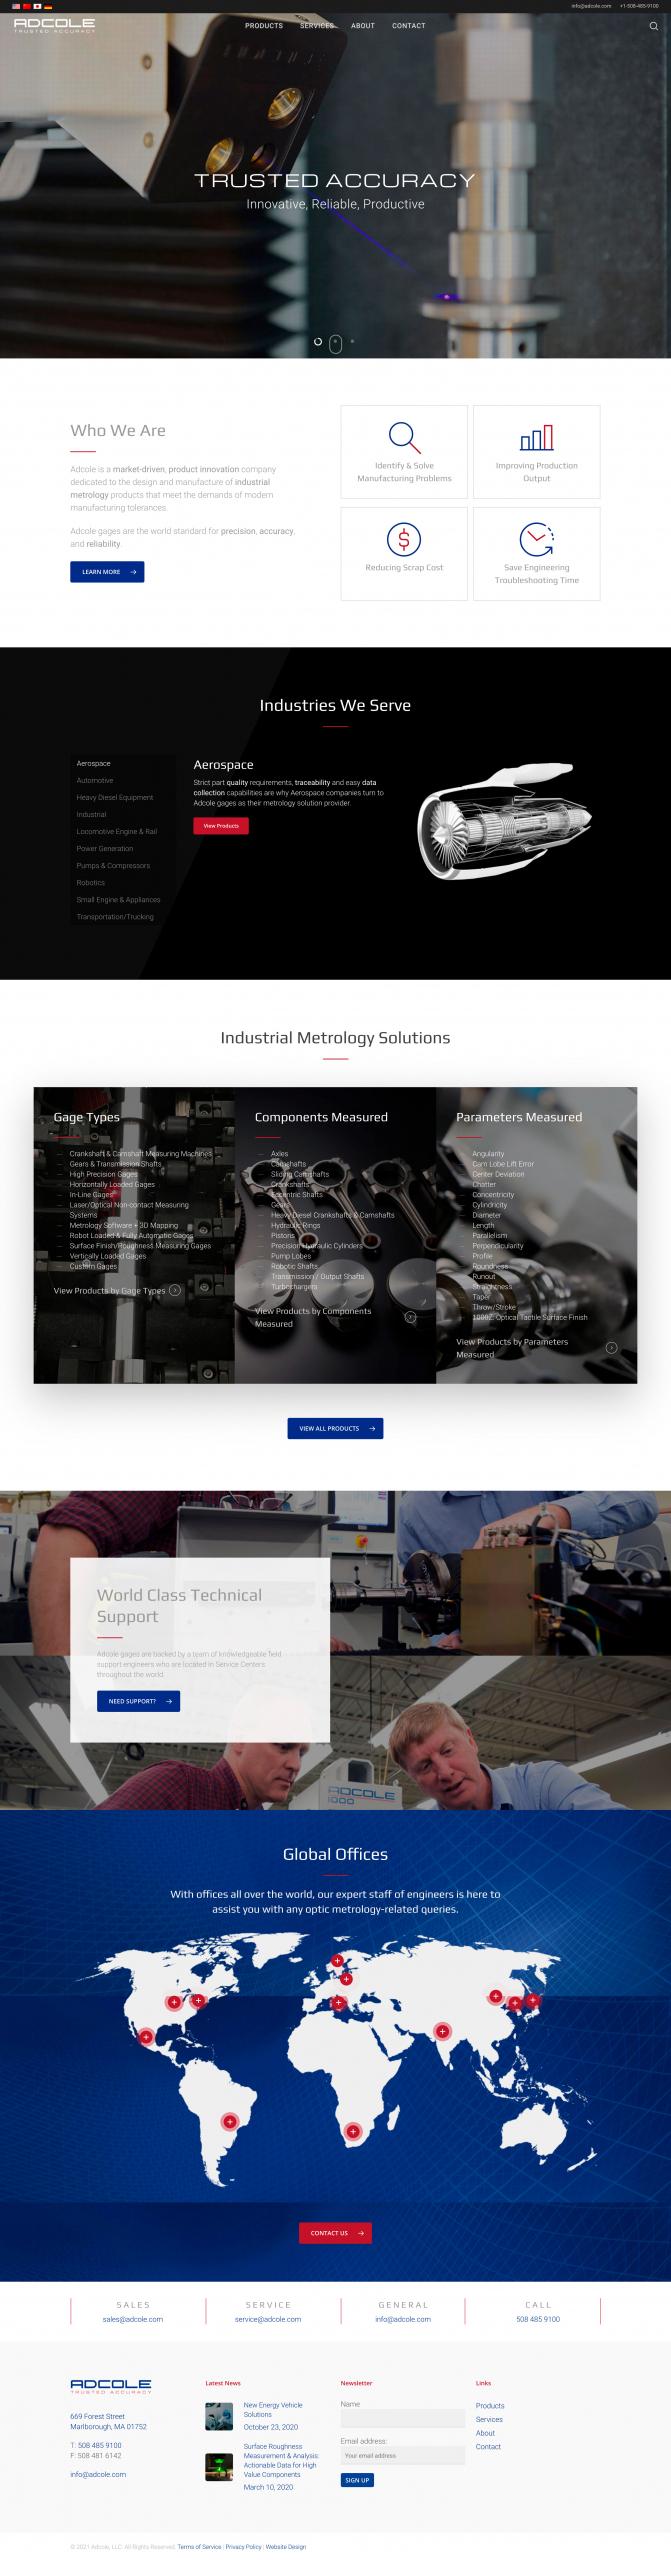 Adcole homepage design